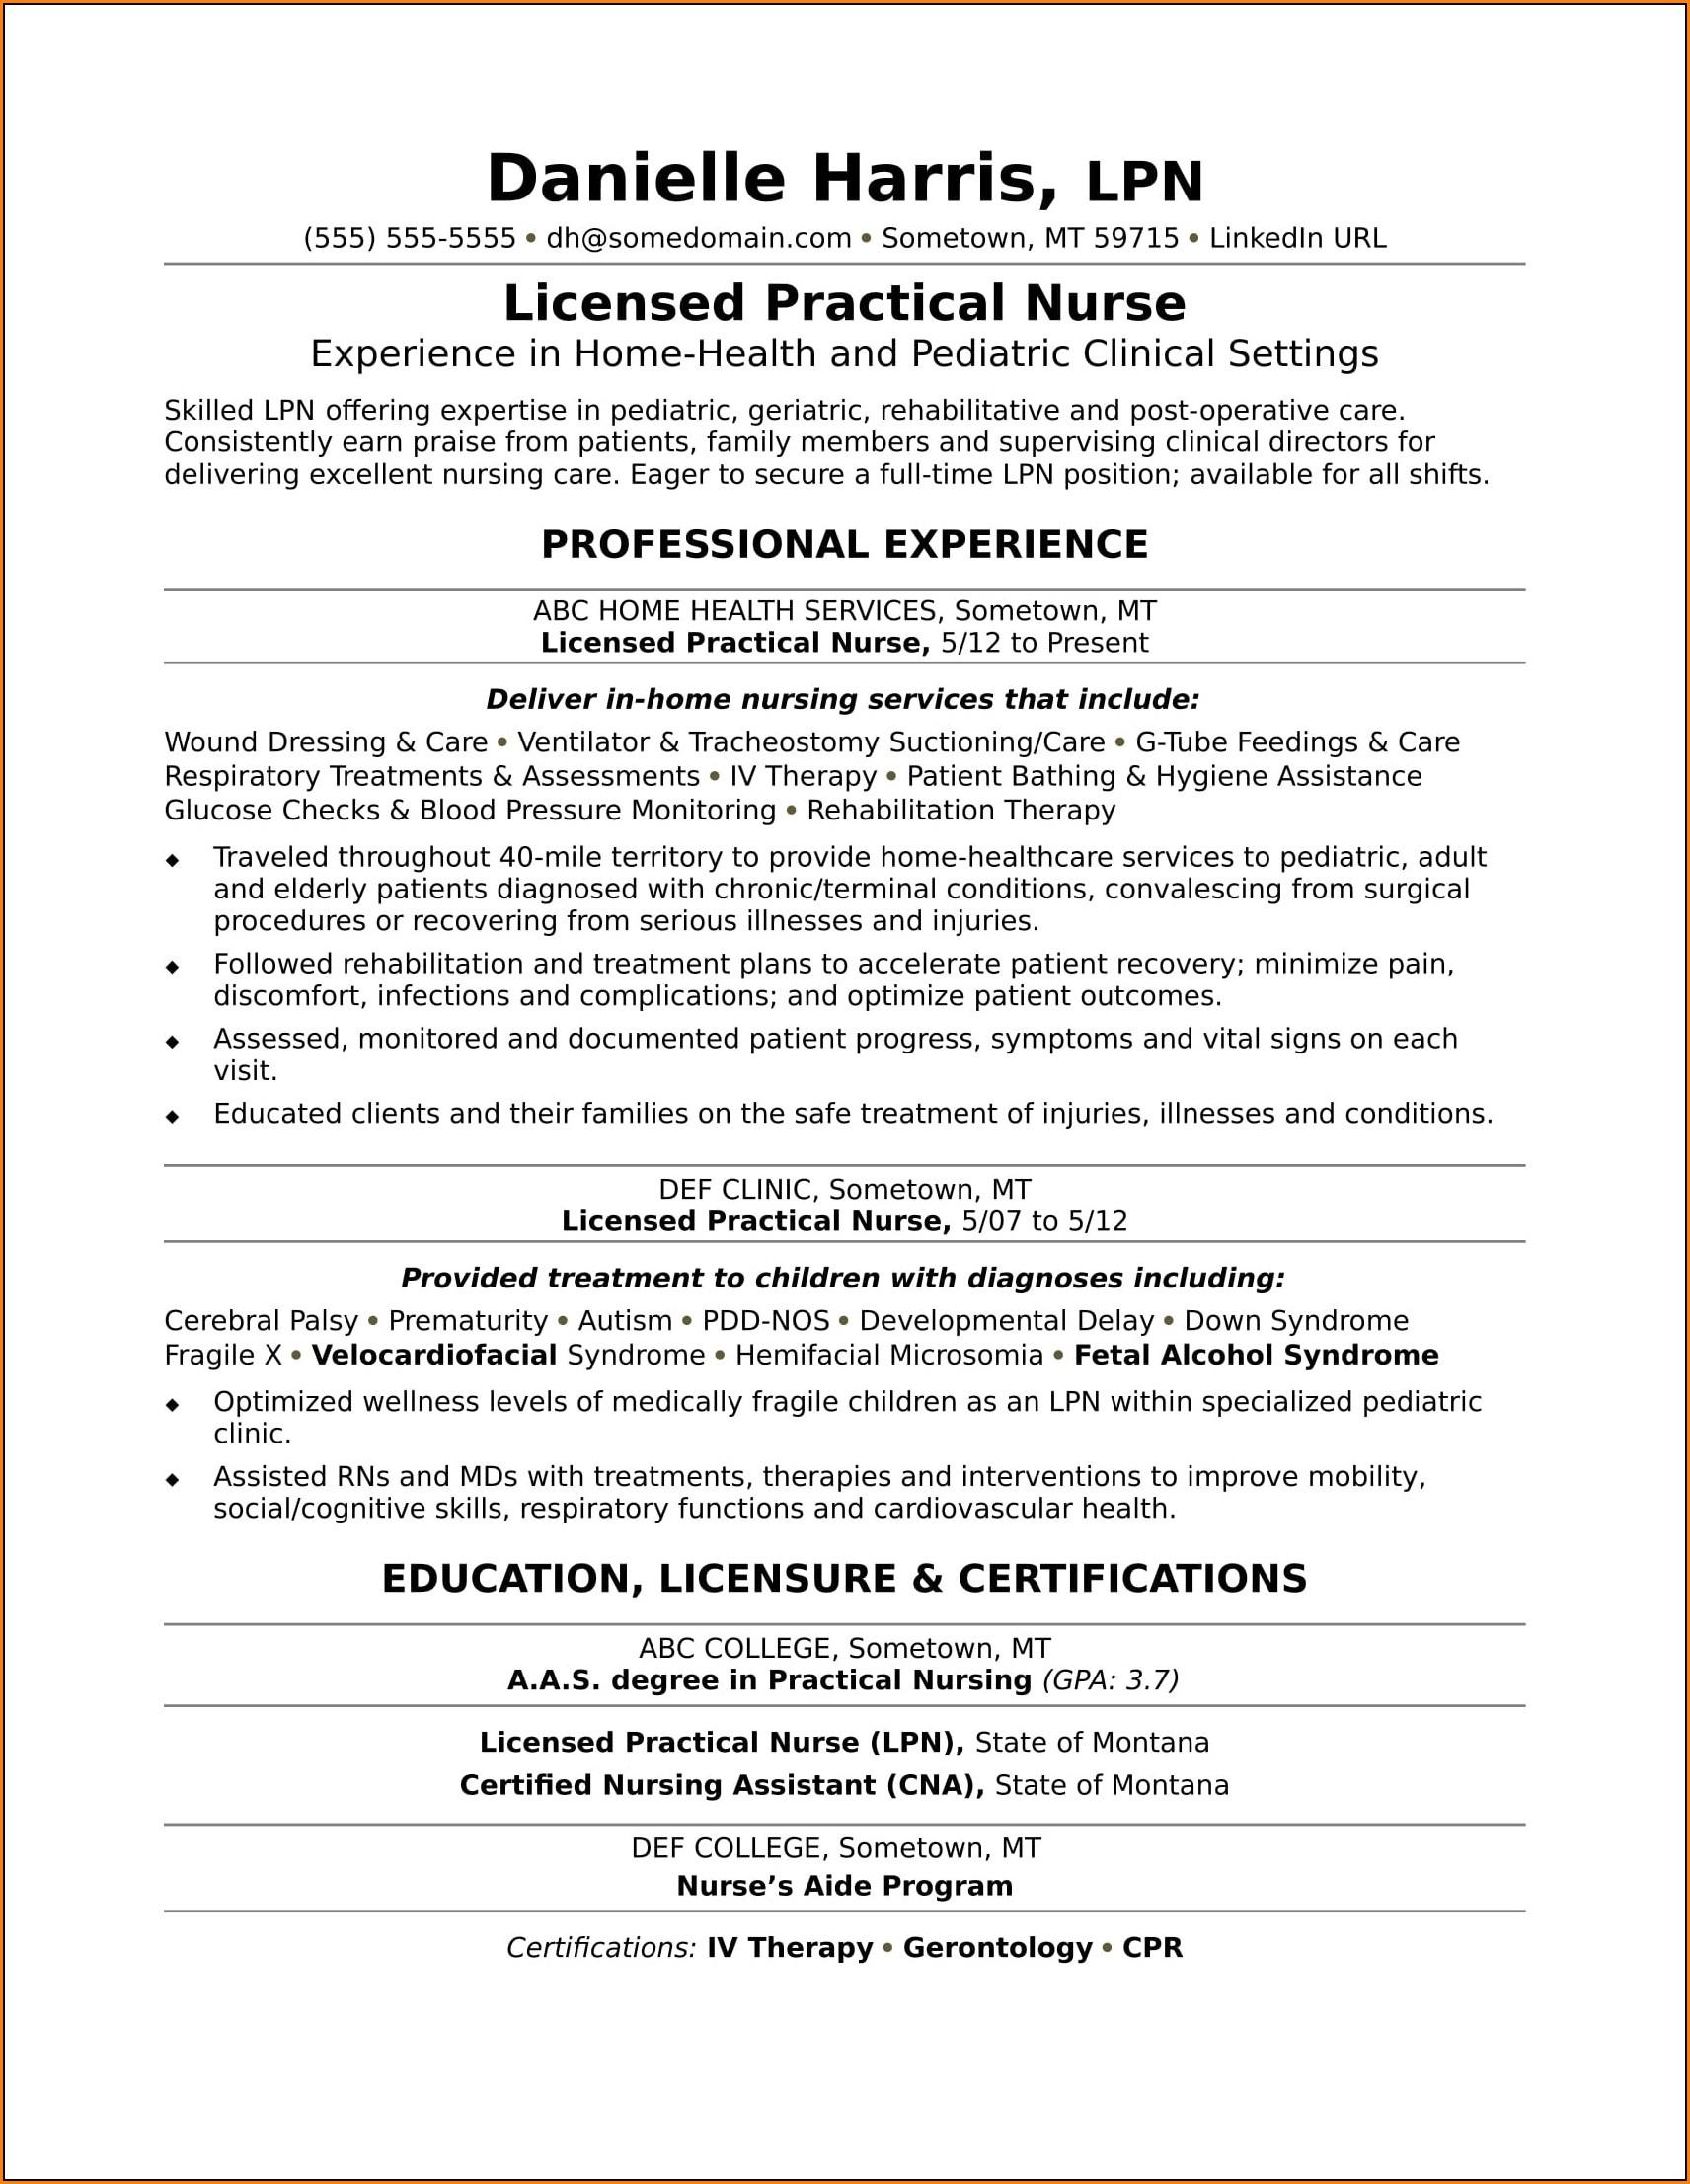 Resume Templates For Nurses Lpn